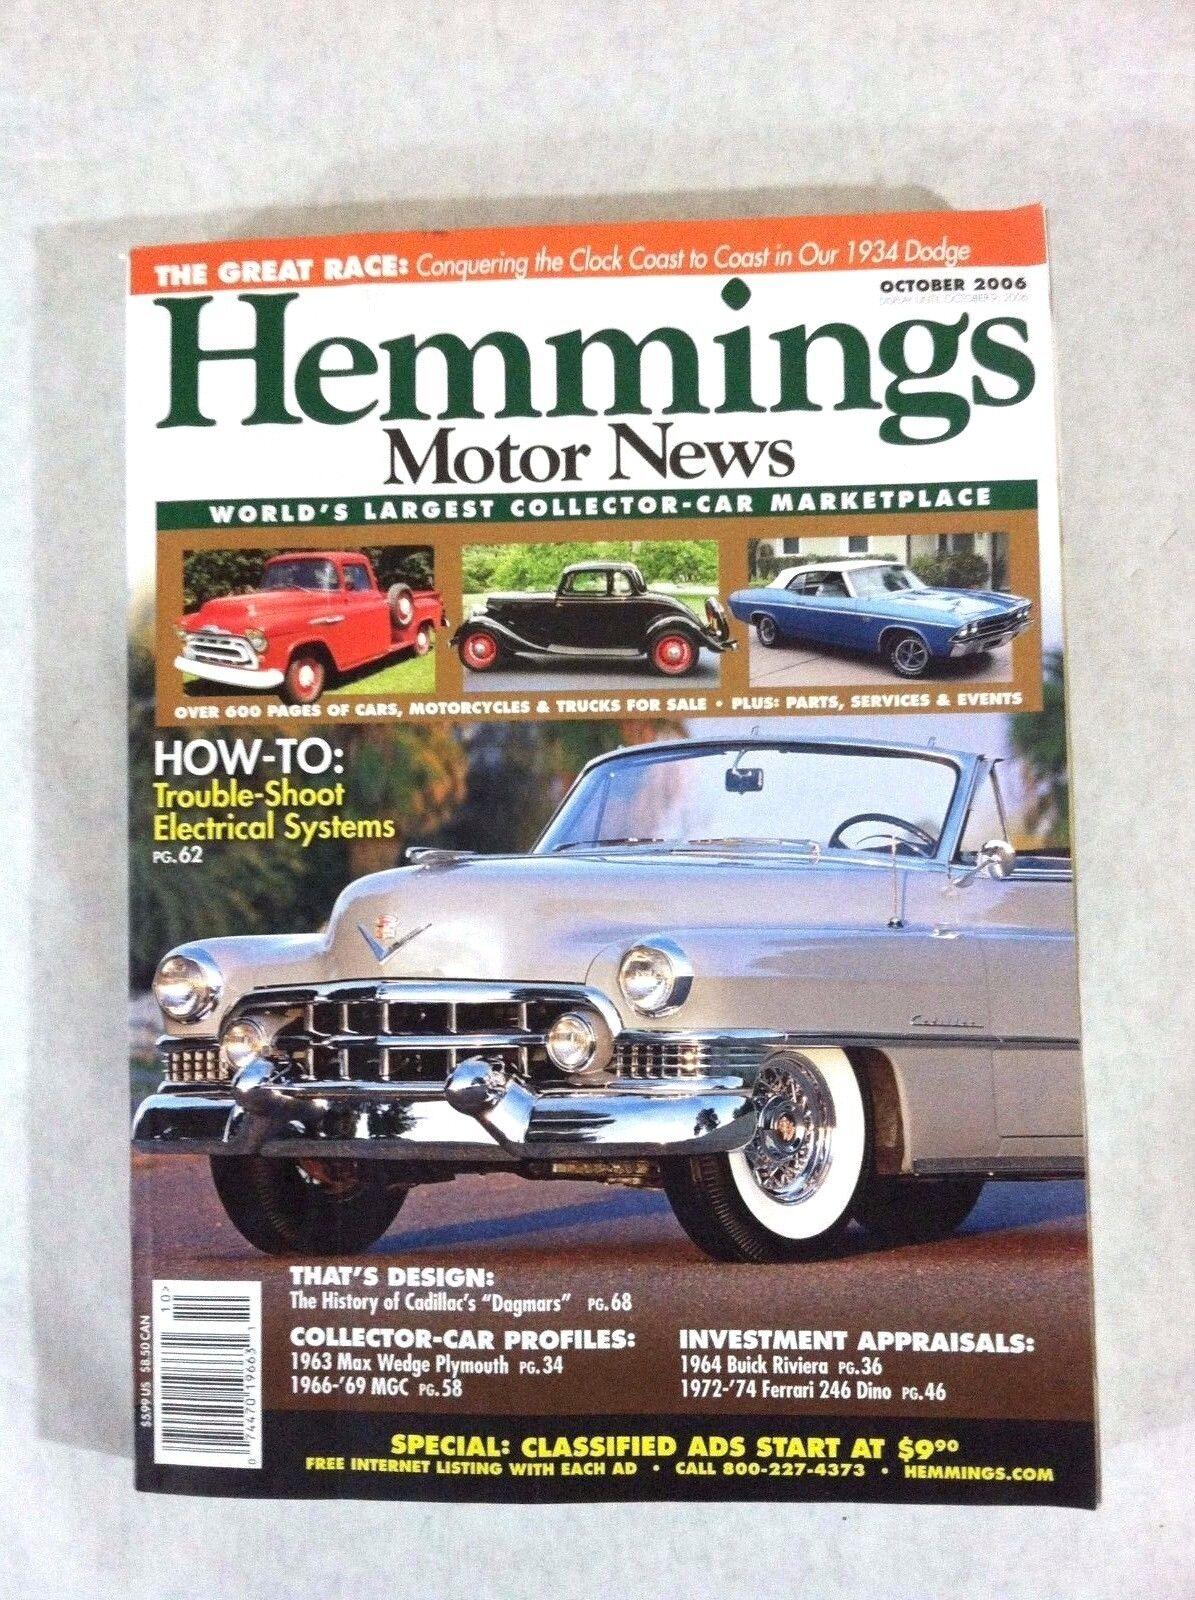 Hemmings Classified. Latest Ford Ranchero For Sale Hemmings Motor ...